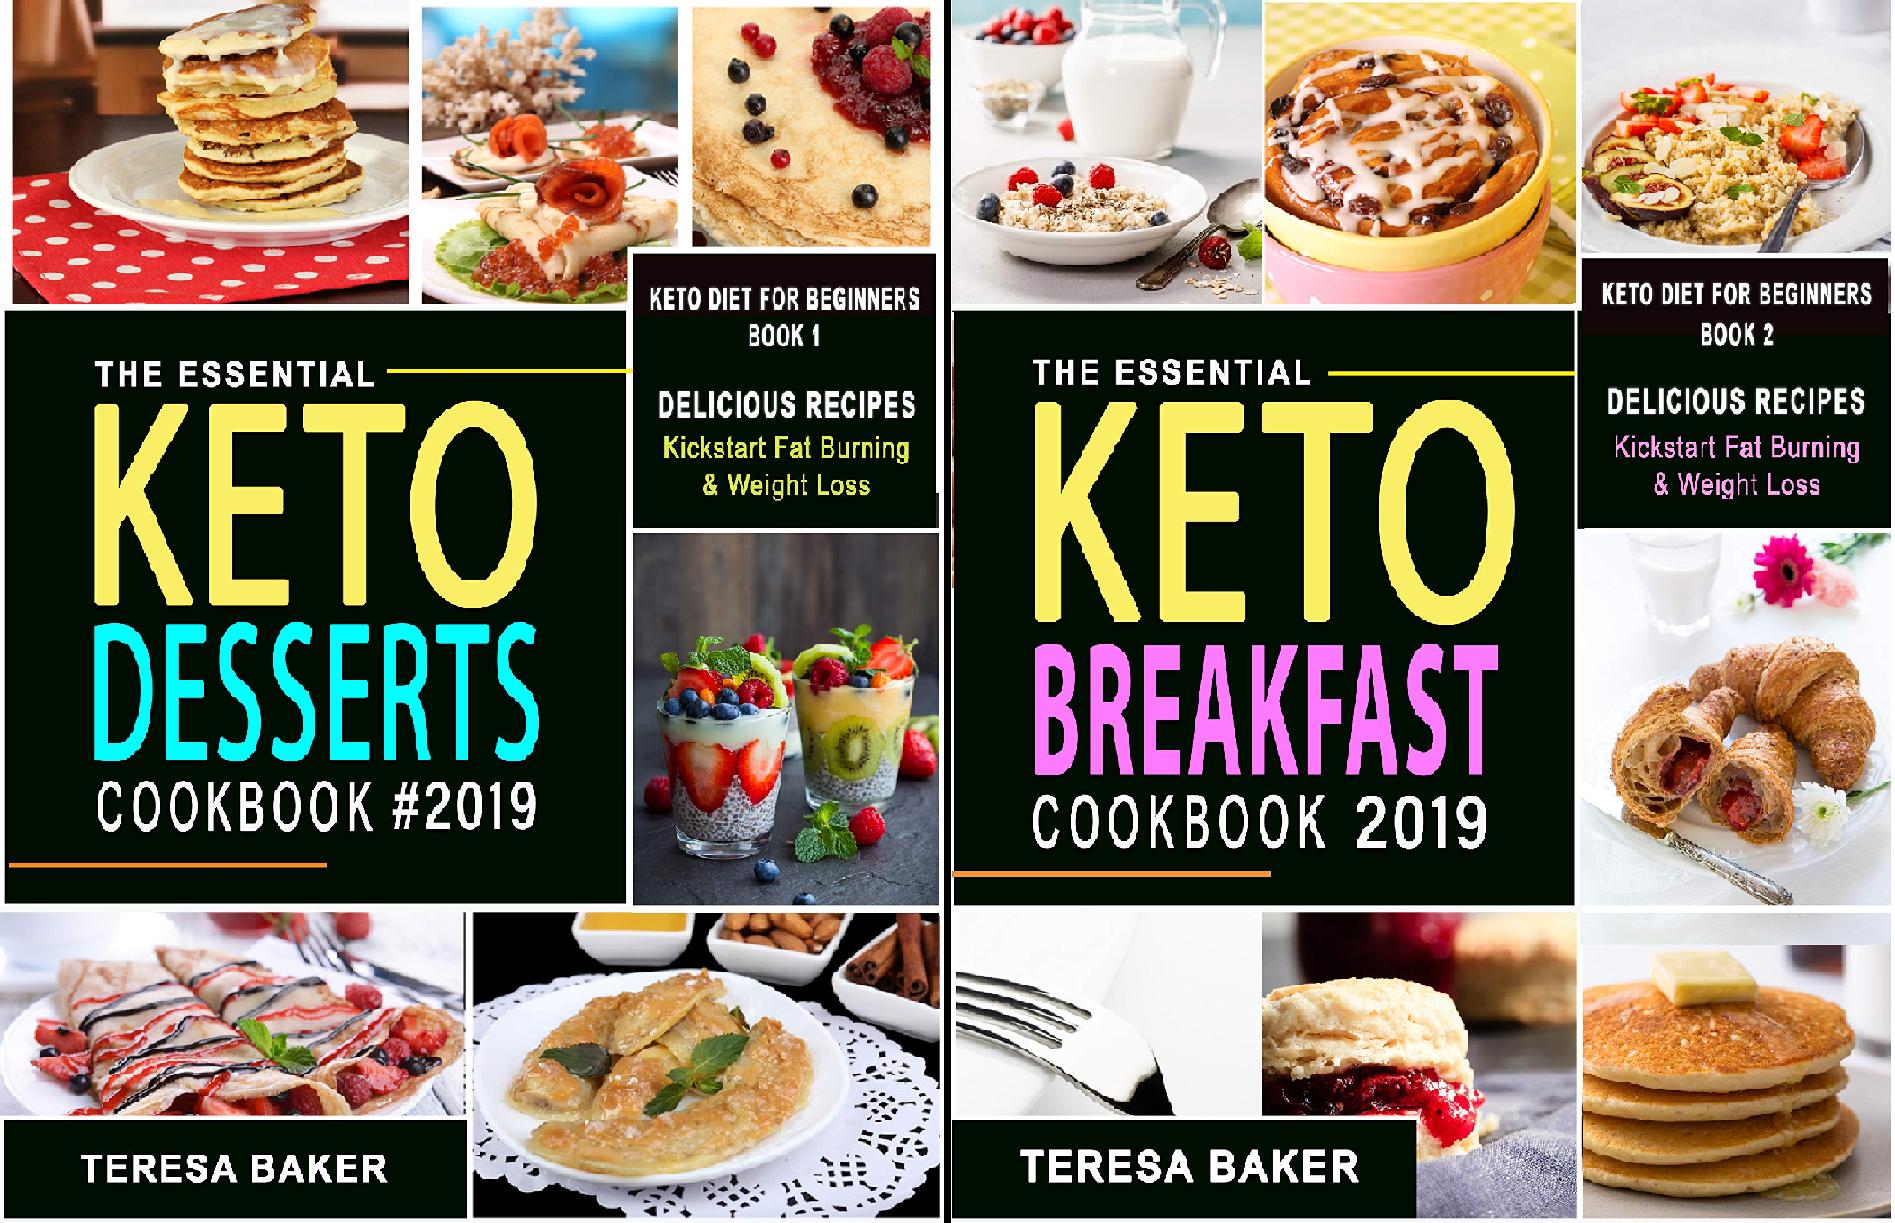 Keto Diet for Beginners (2 Book Series)